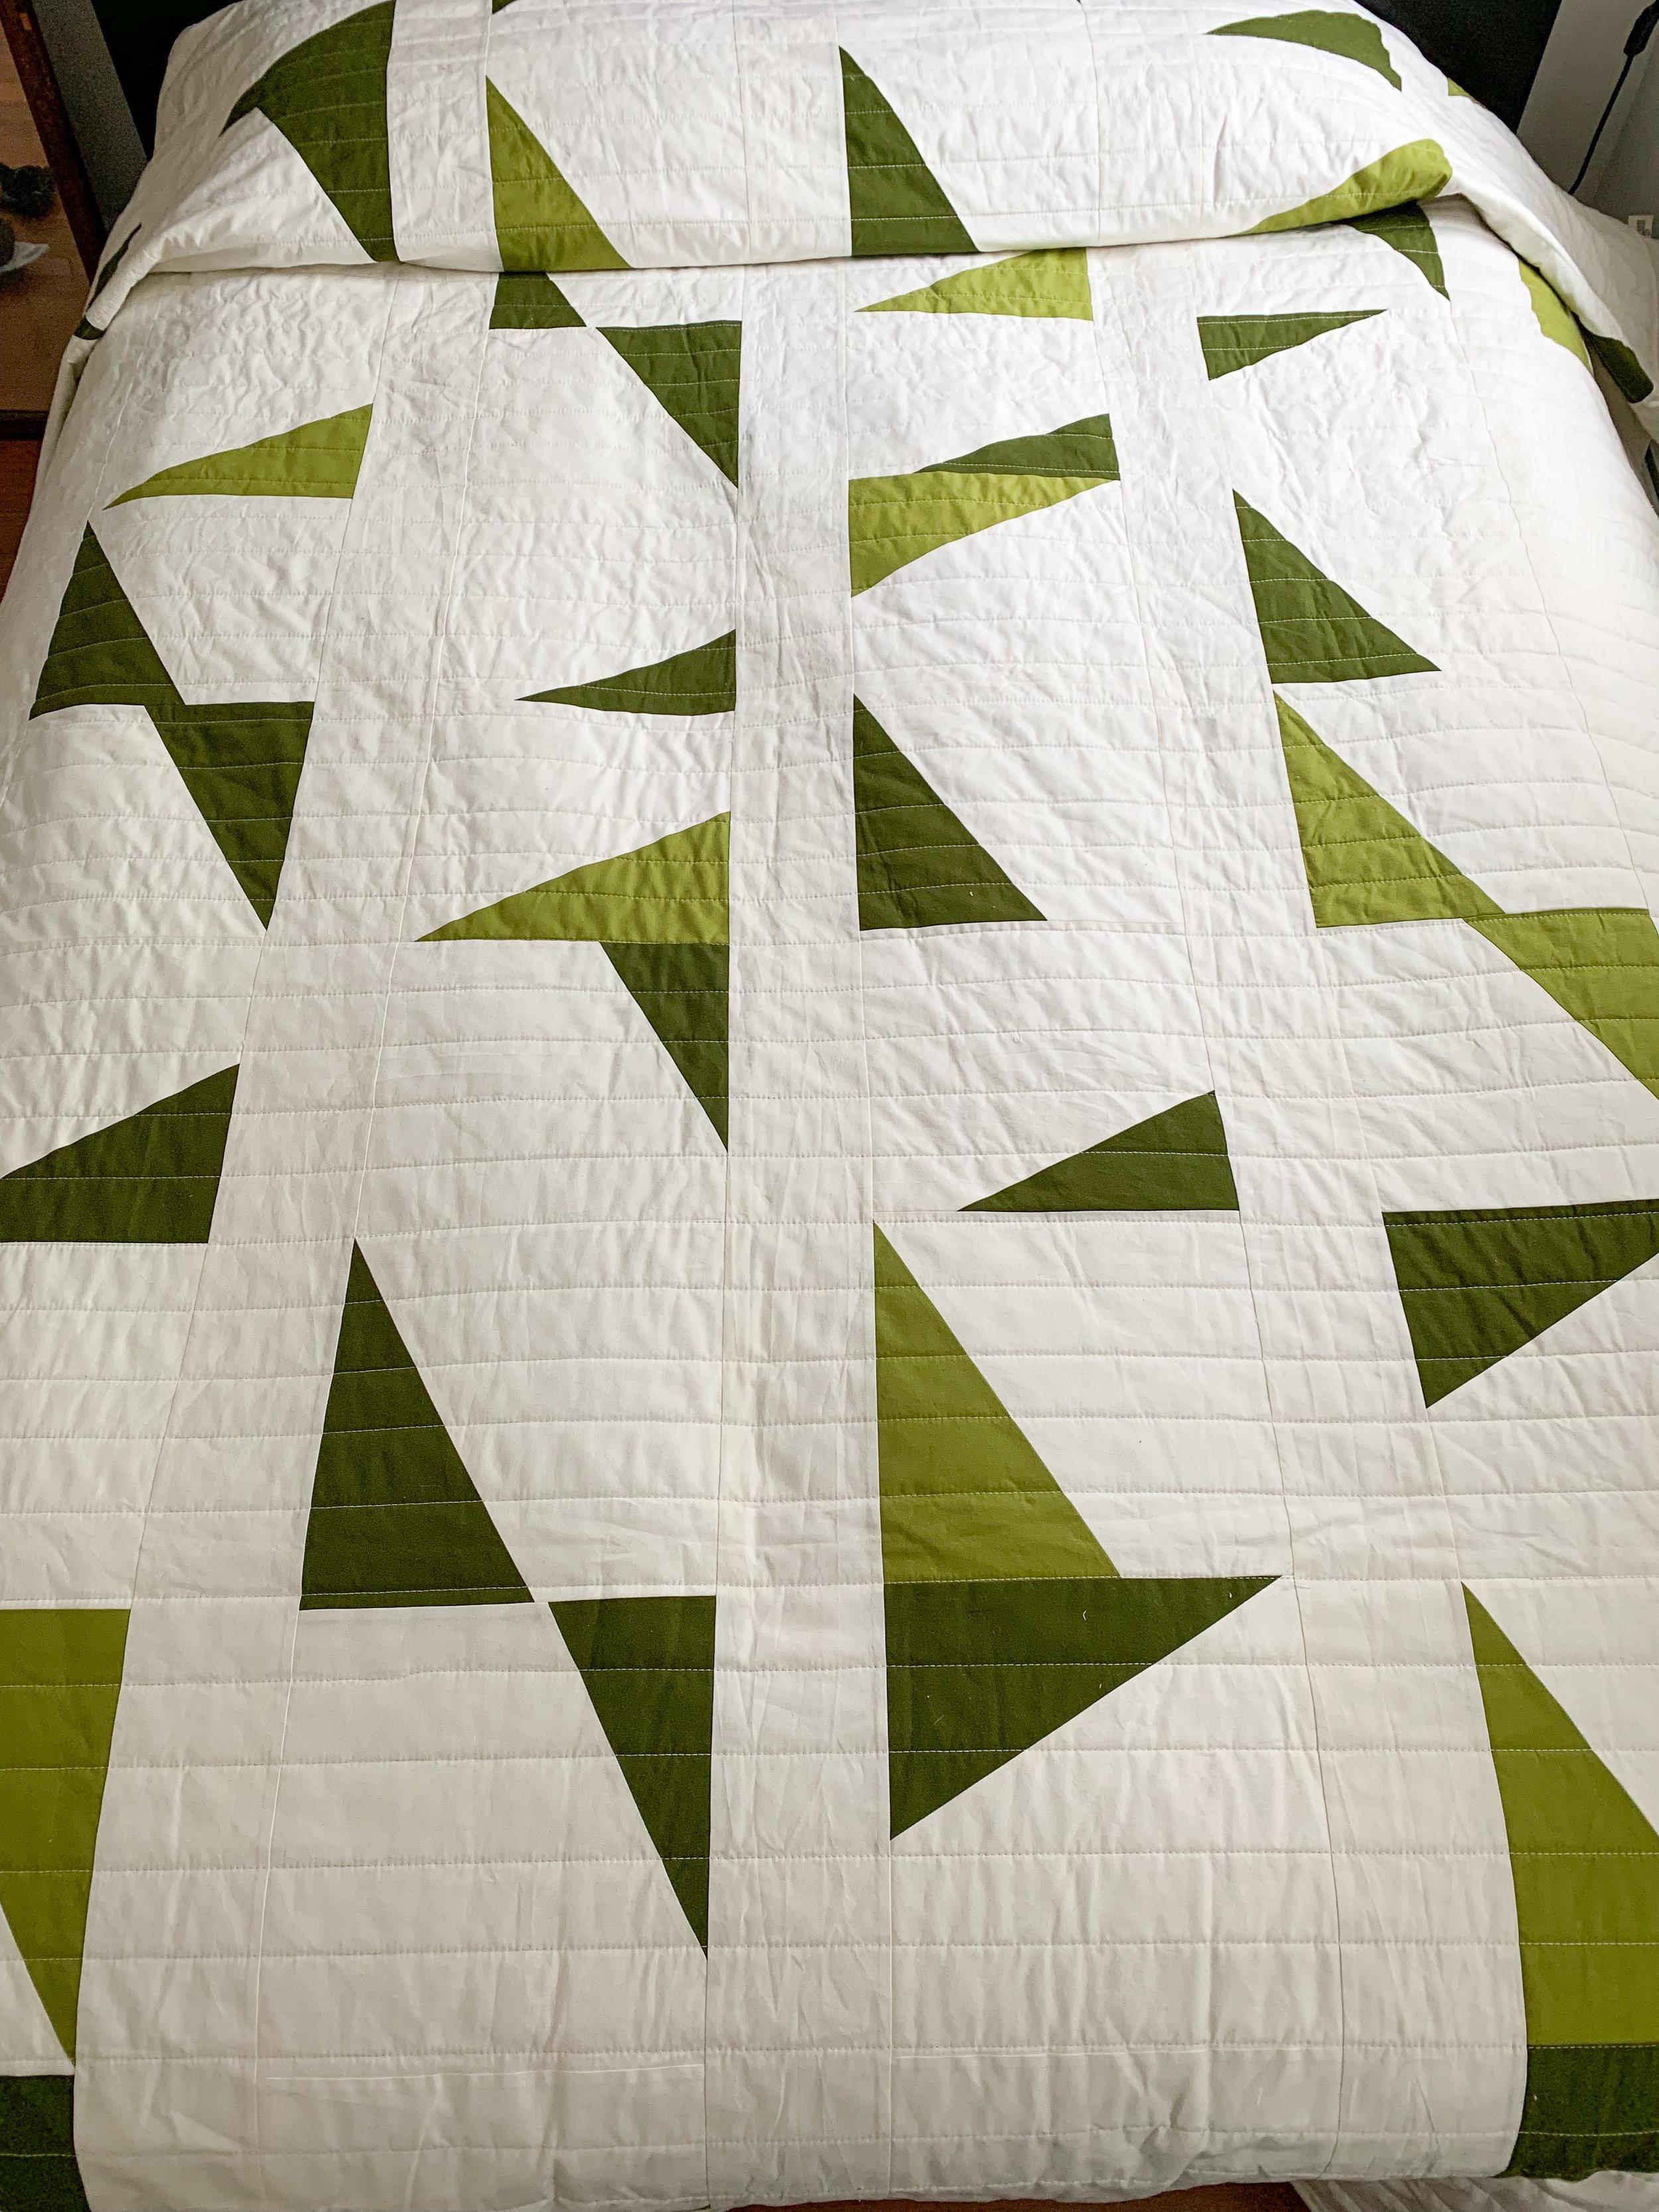 Queen Green Triangles 72dpi-2.jpg